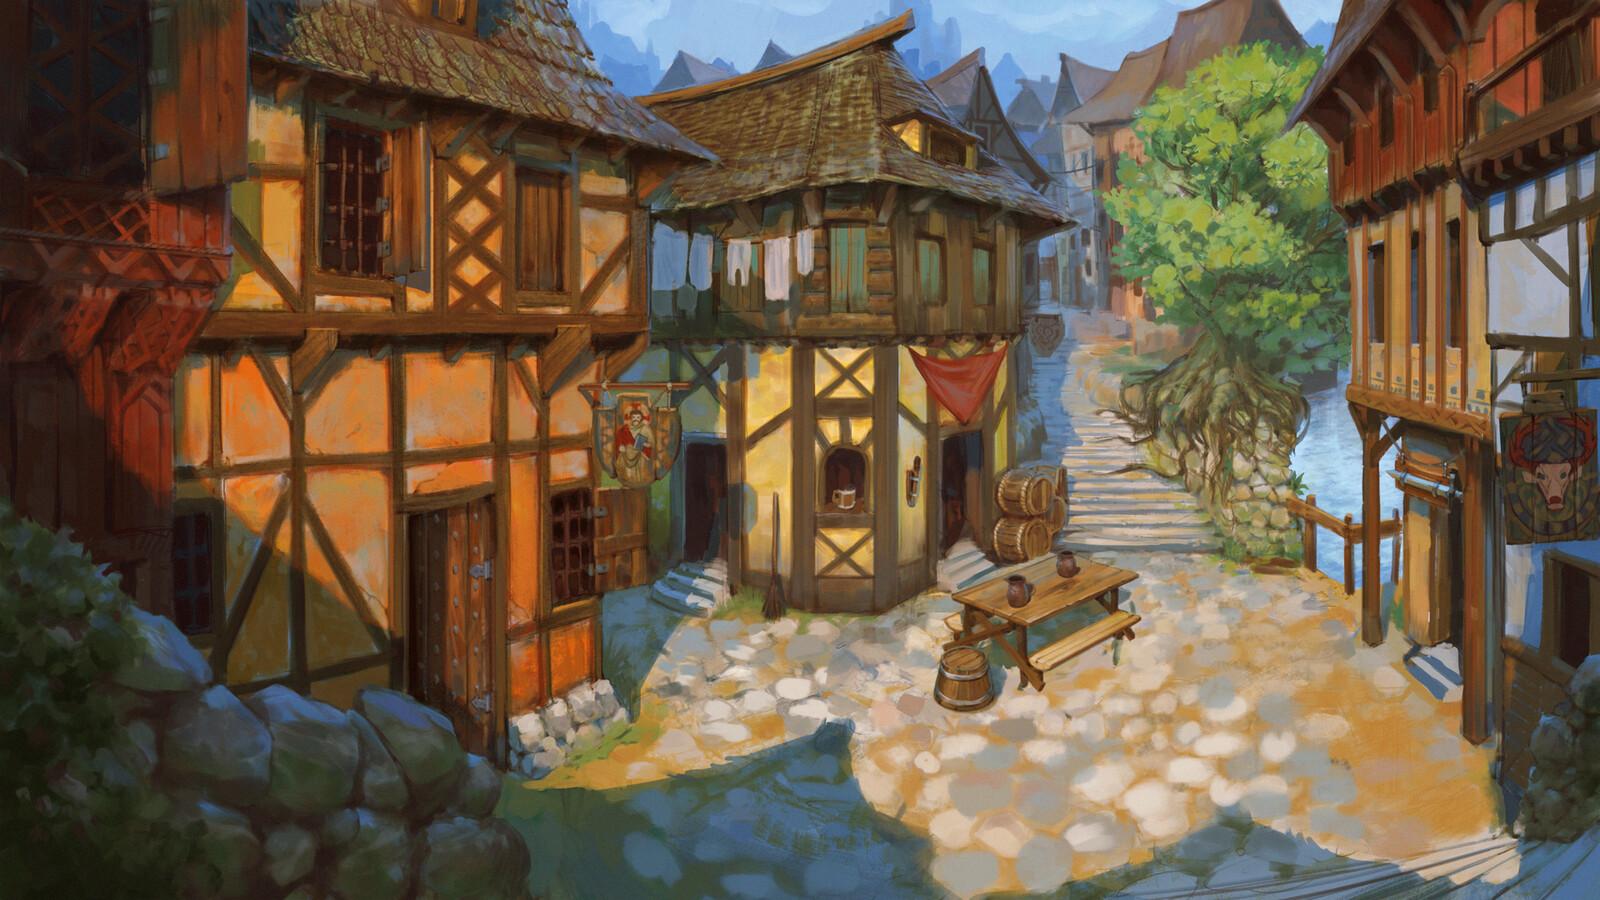 Strasbourg inspired medieval city